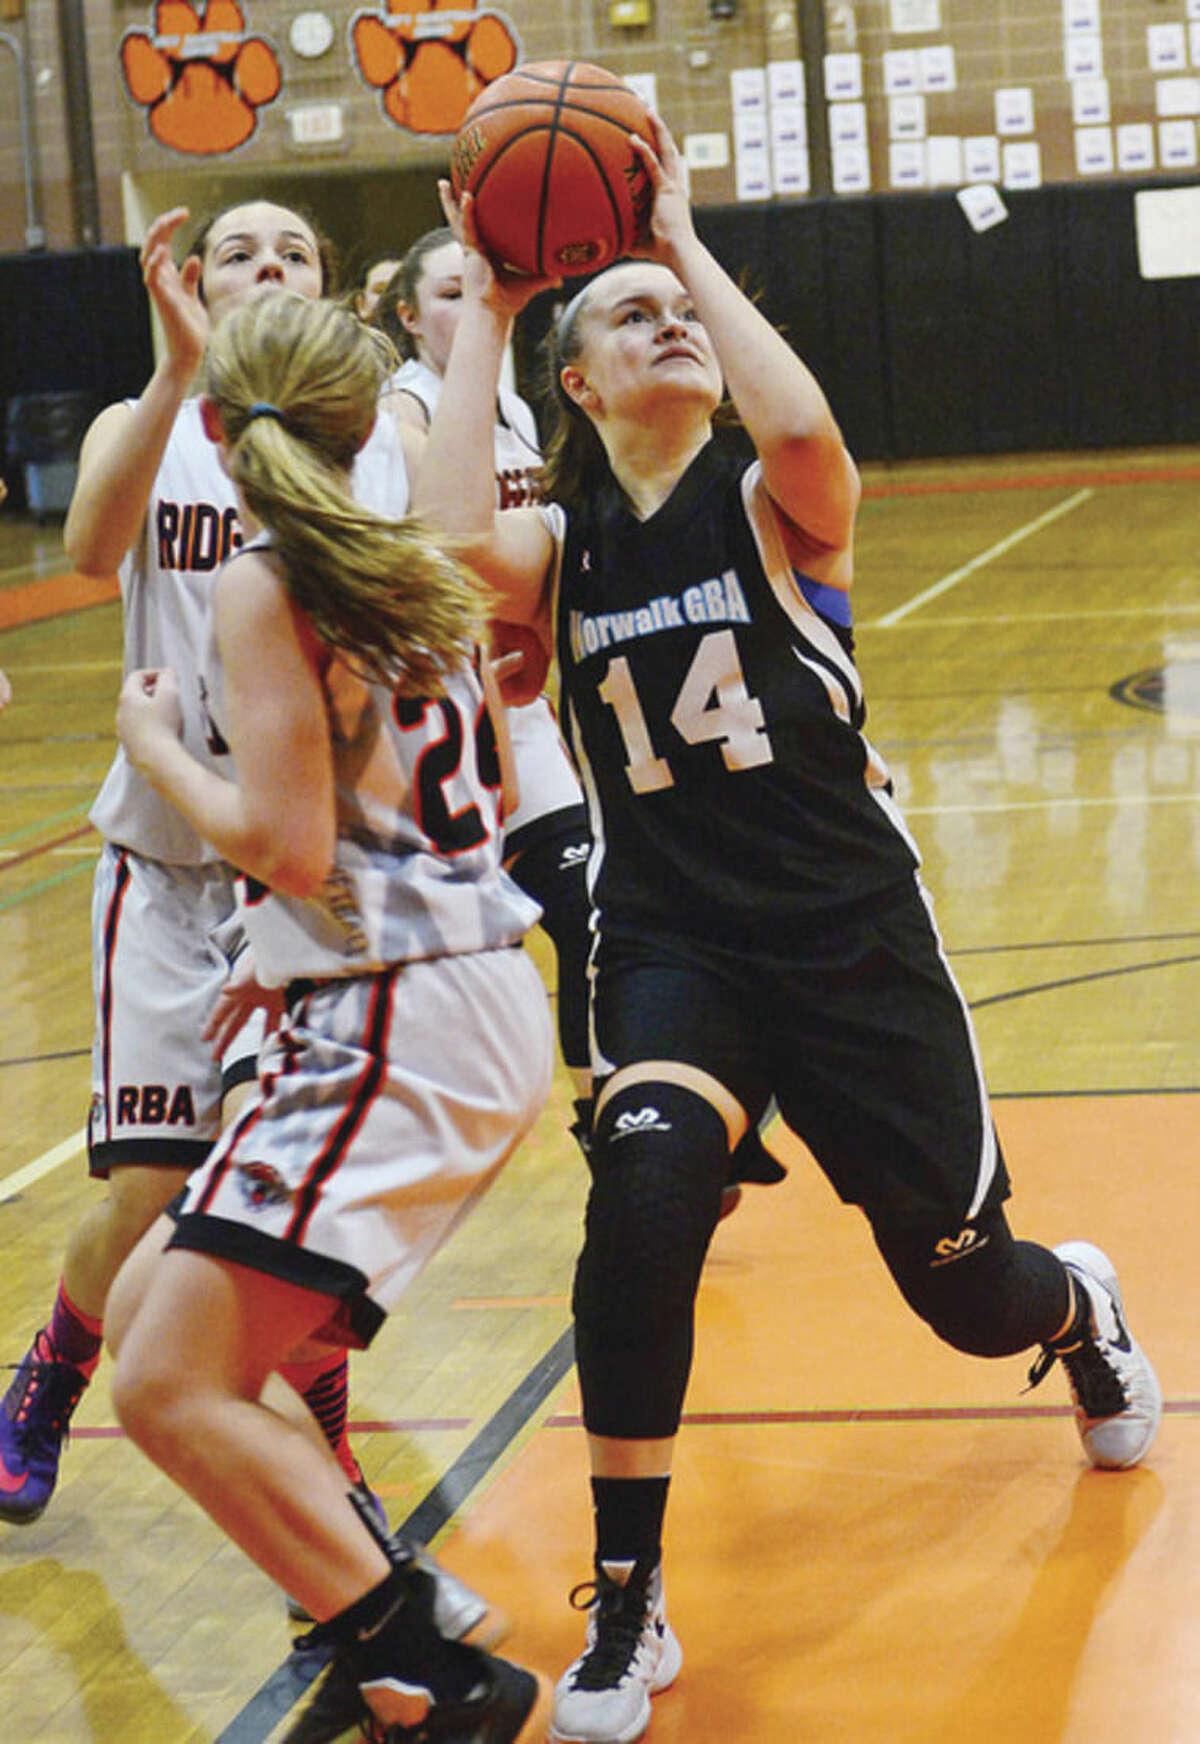 Hour photo / Erik Trautmann Norwalk eighth grade girls basketball player Emily Potochney looks to score against Ridgefield Saturday.